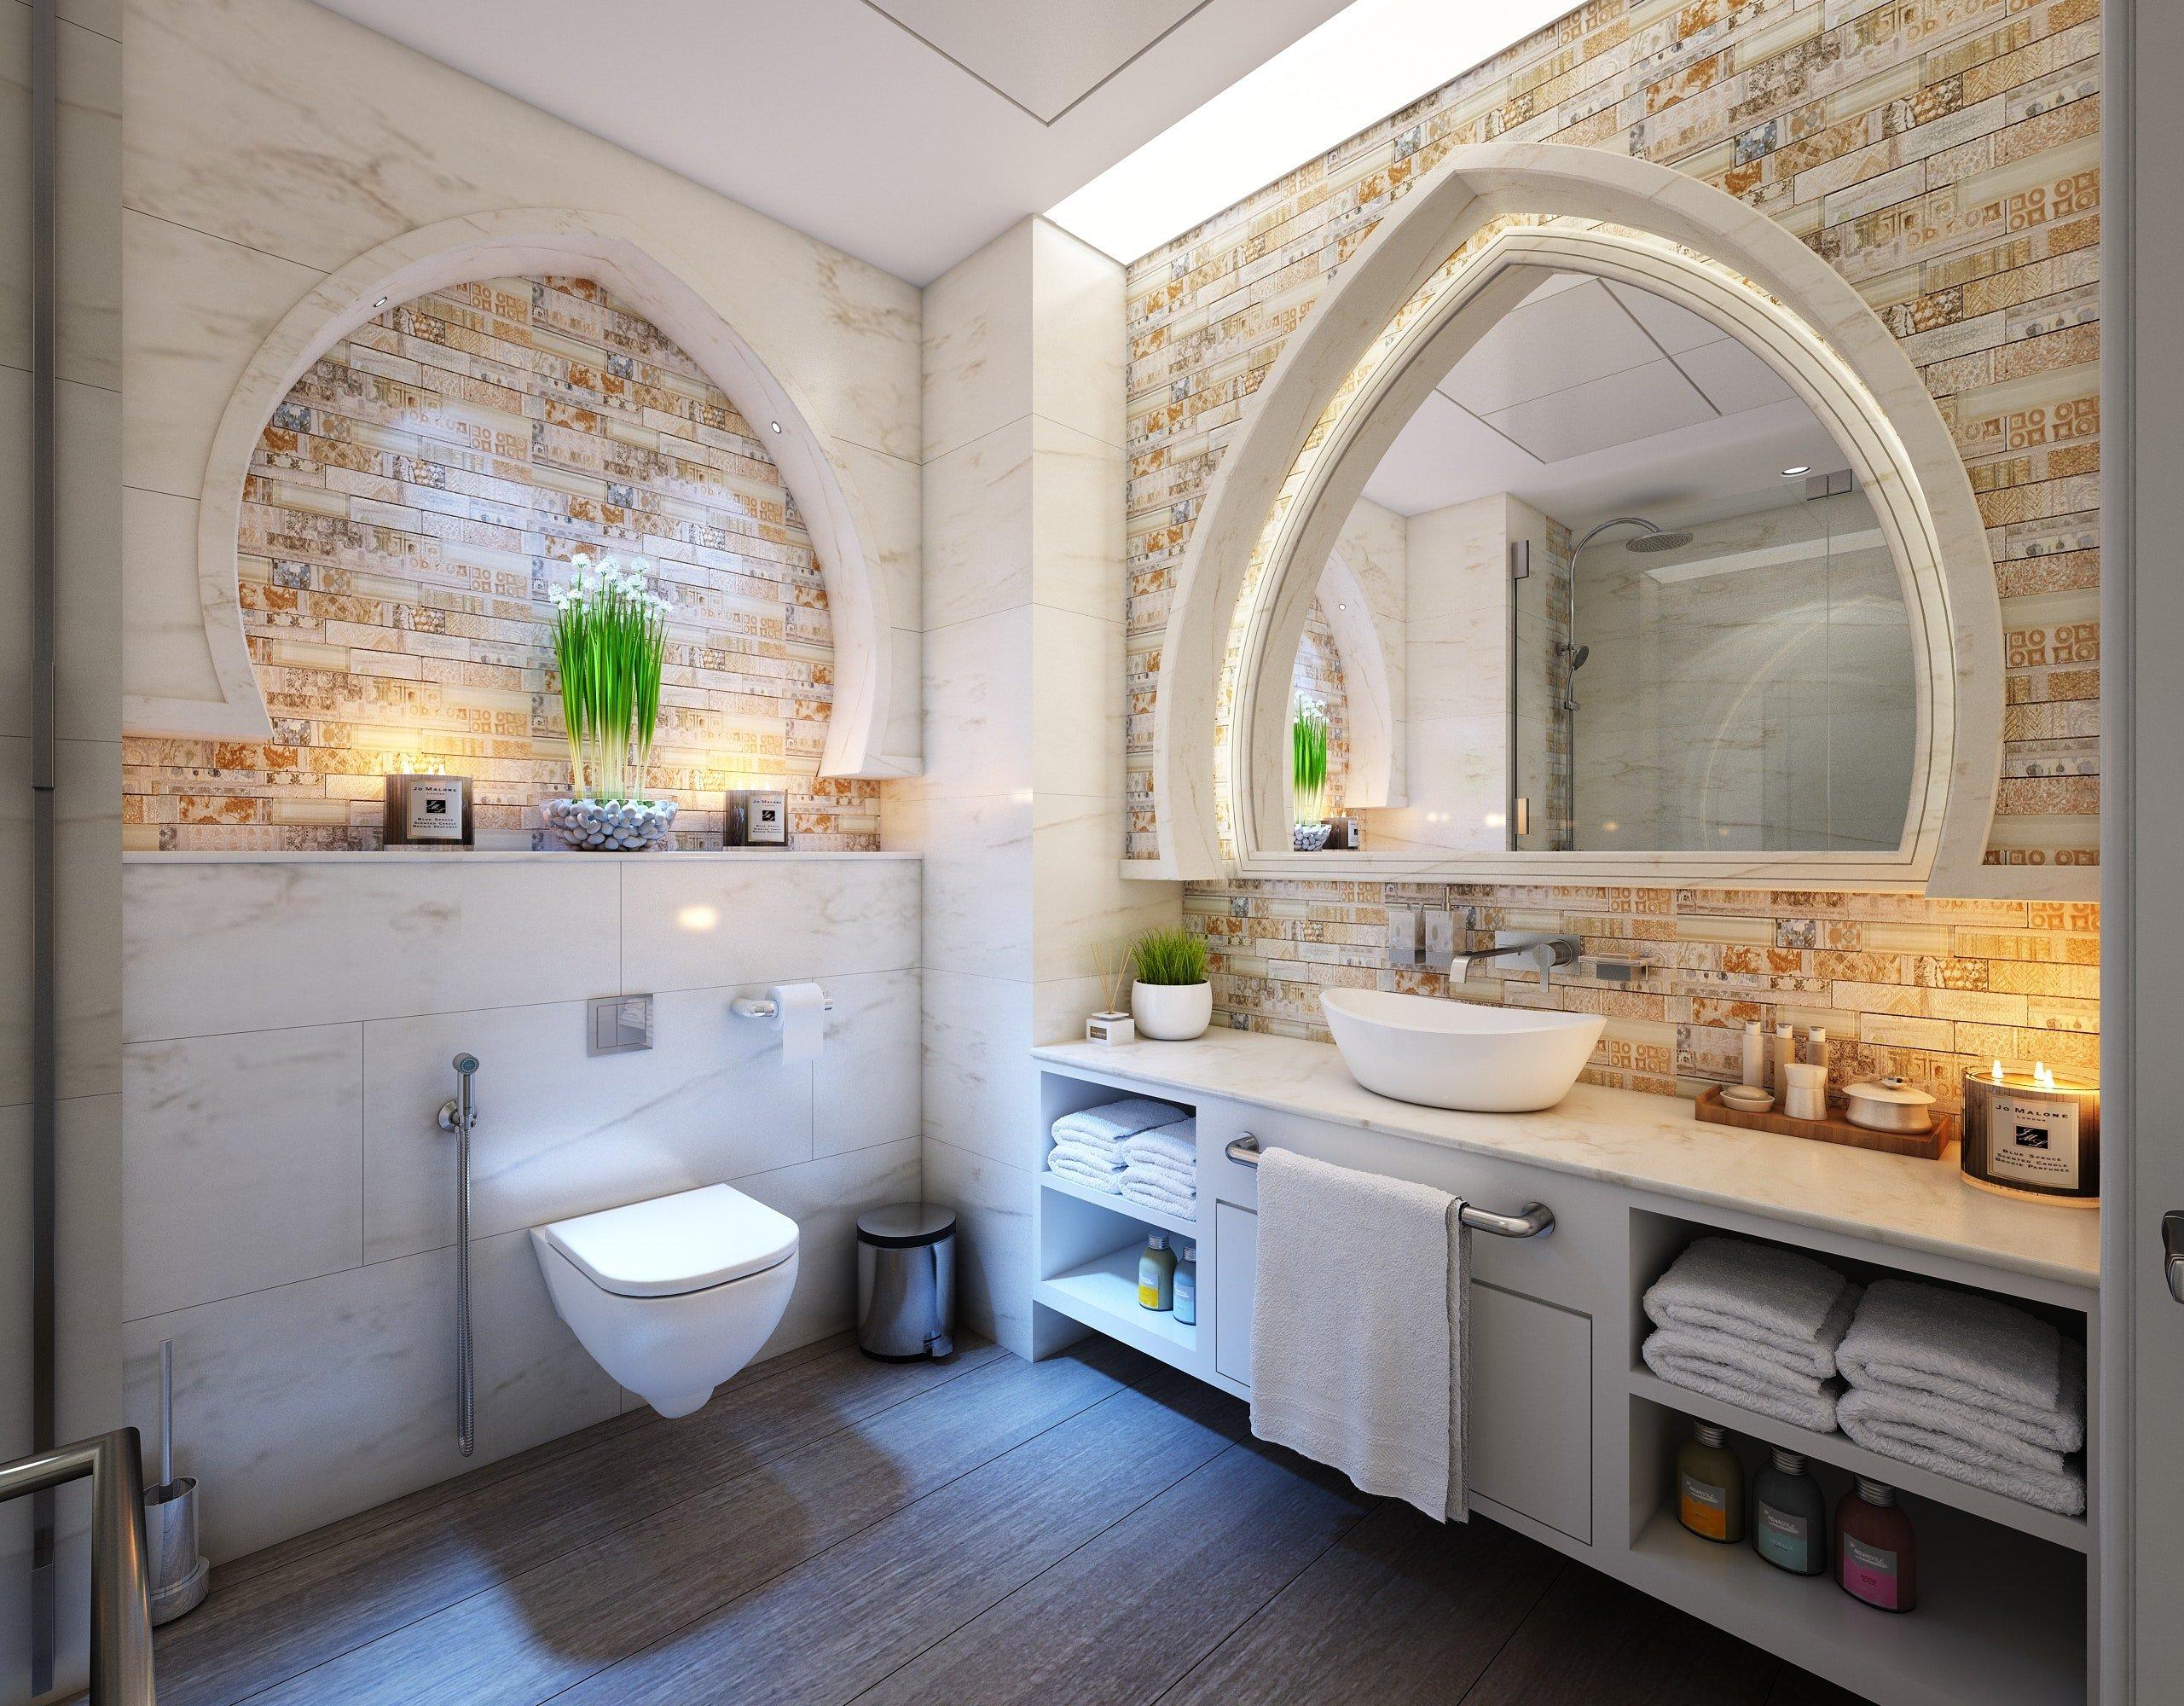 Bathroom Heaven: Creating a Spa Oasis